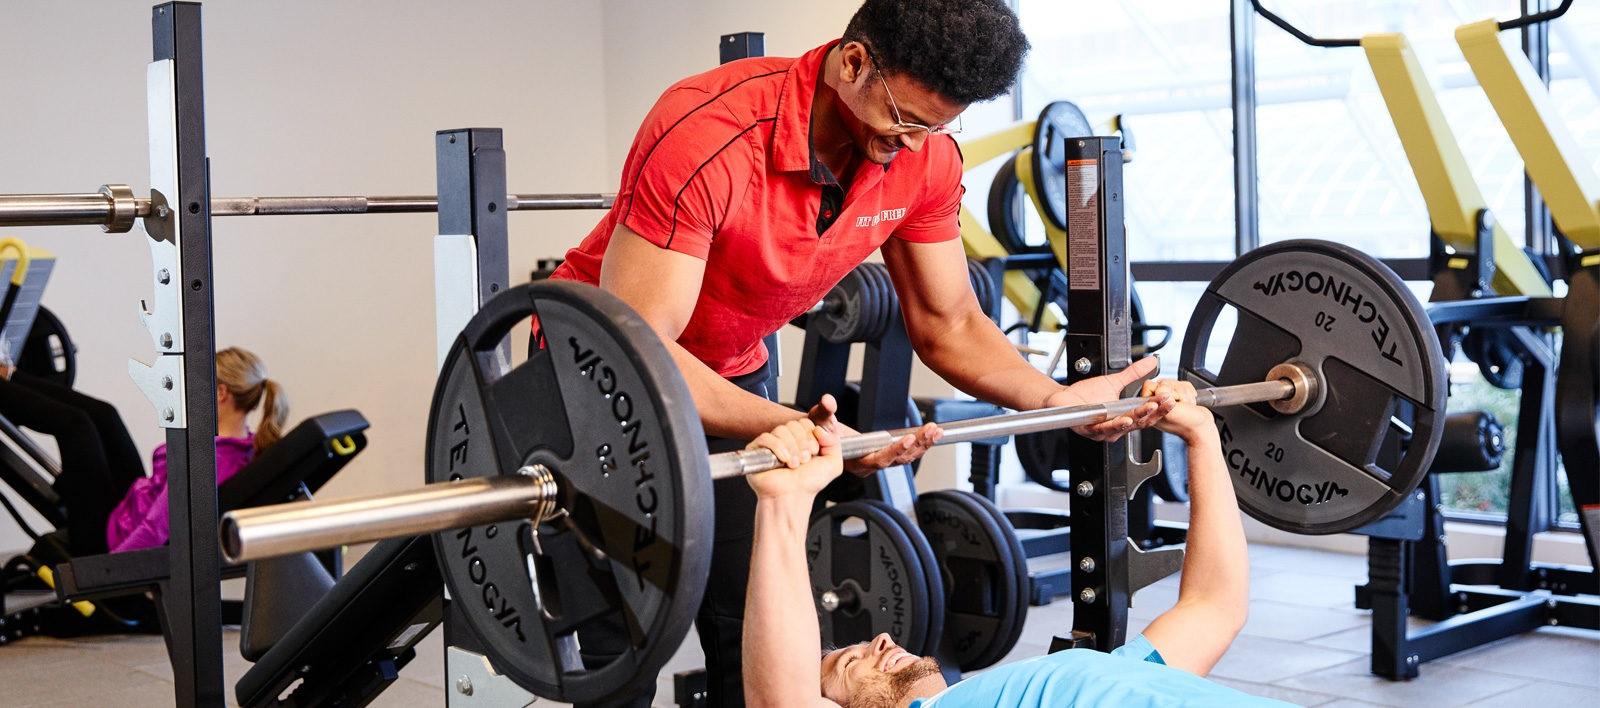 Fit For Free; sporten op de manier wat bij u past